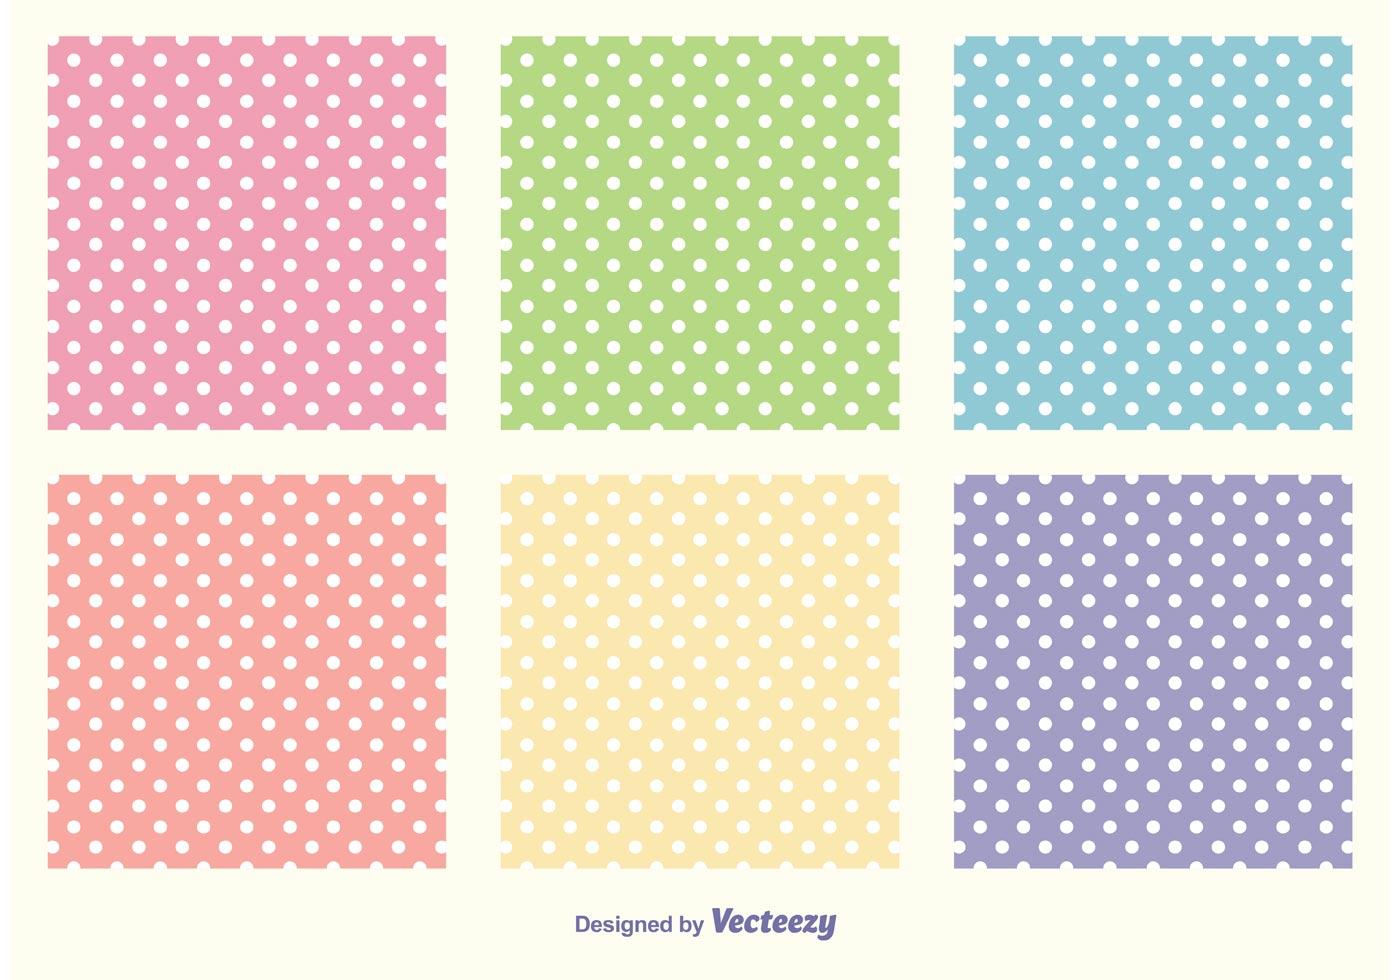 Polka Dot Free Vector Art Downloads | Over 13,000 Free Files!